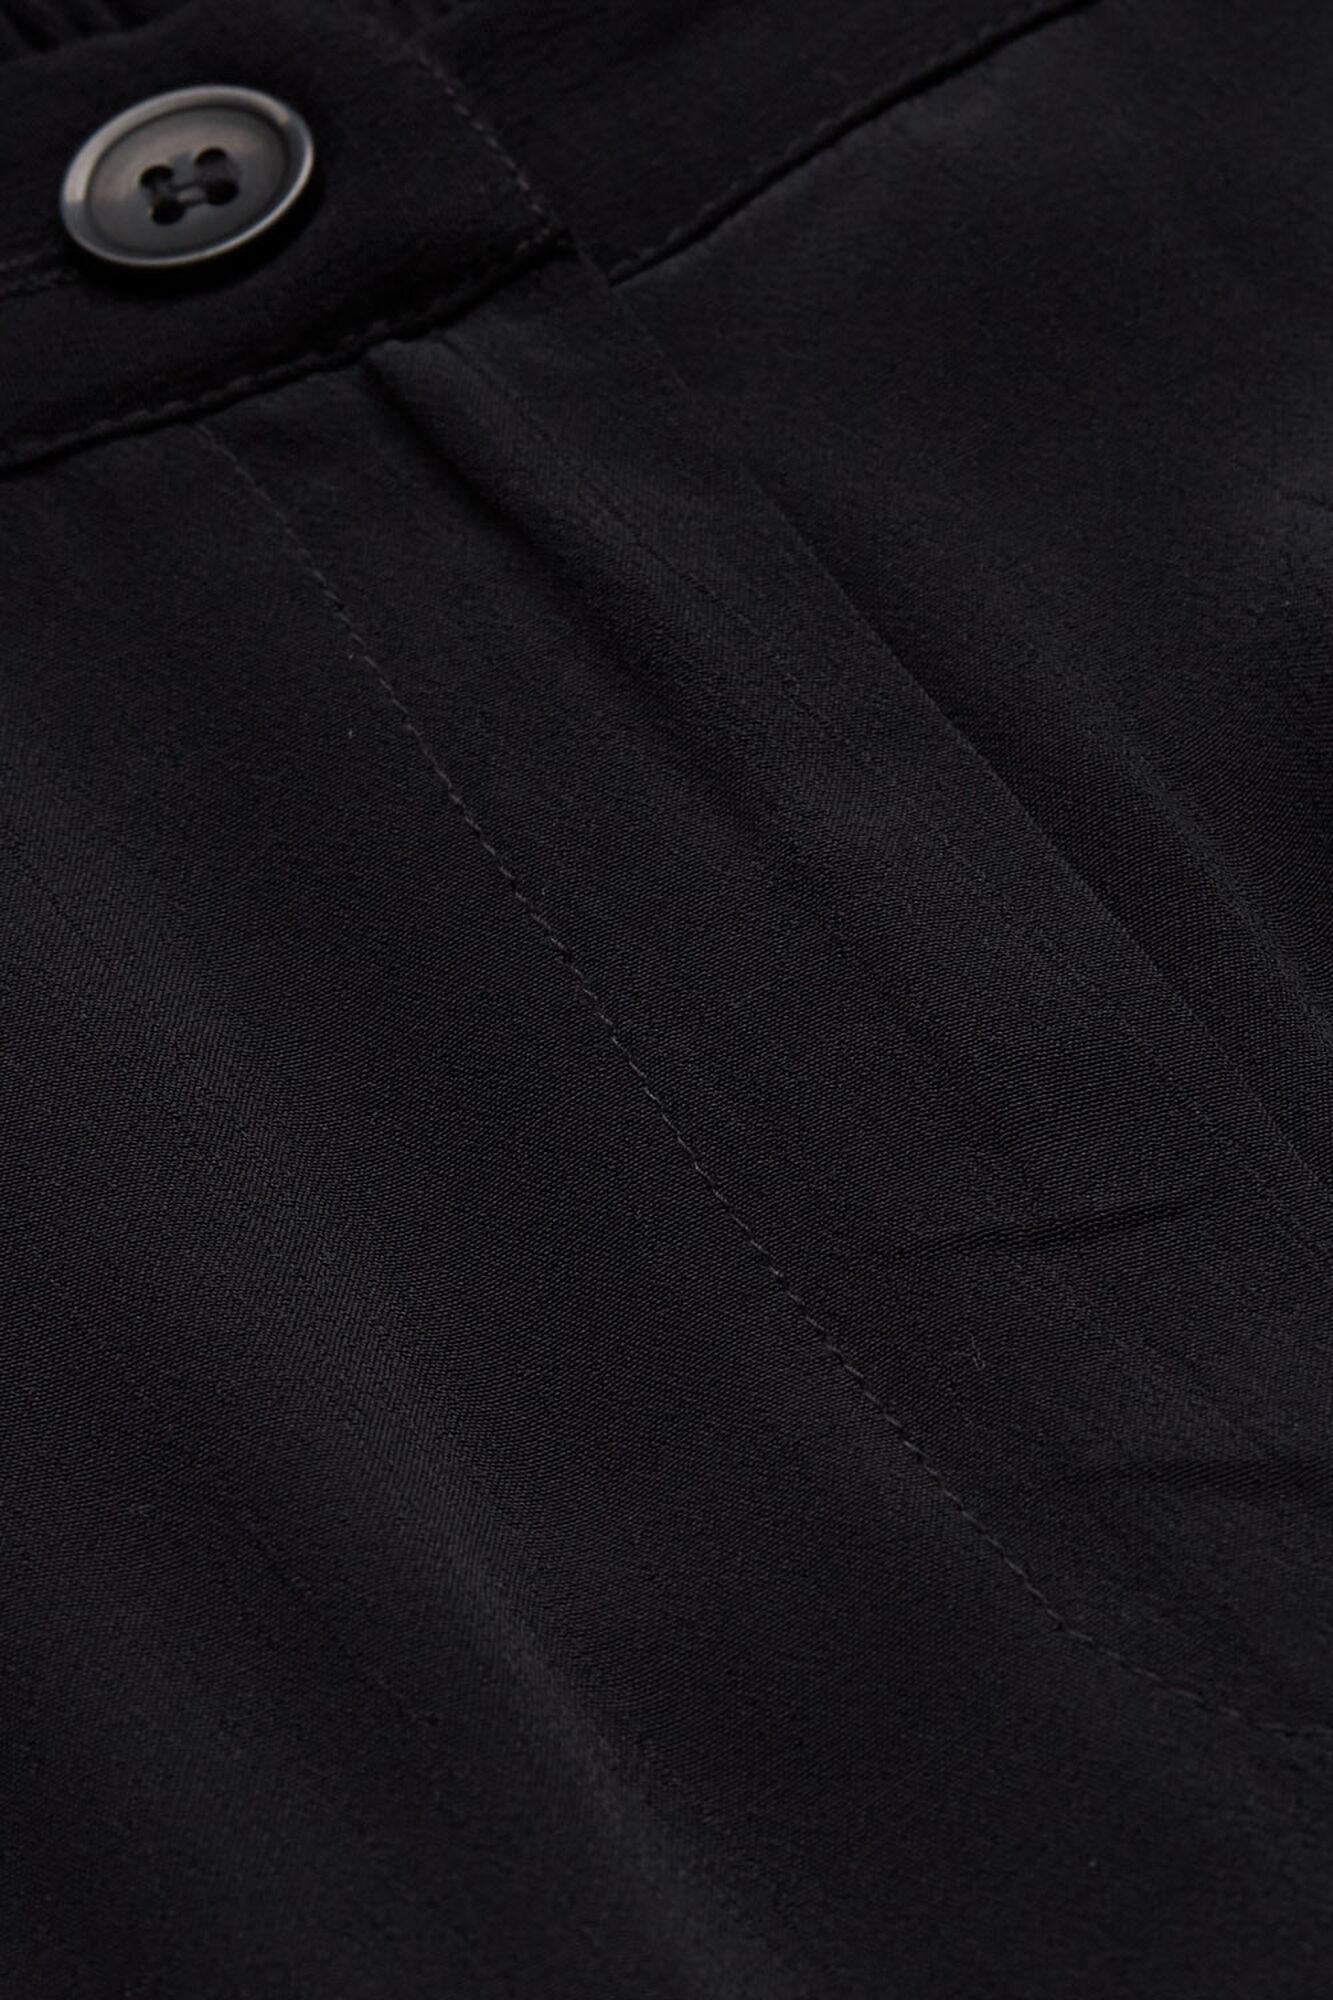 PERINUS TROUSERS, Black, hi-res